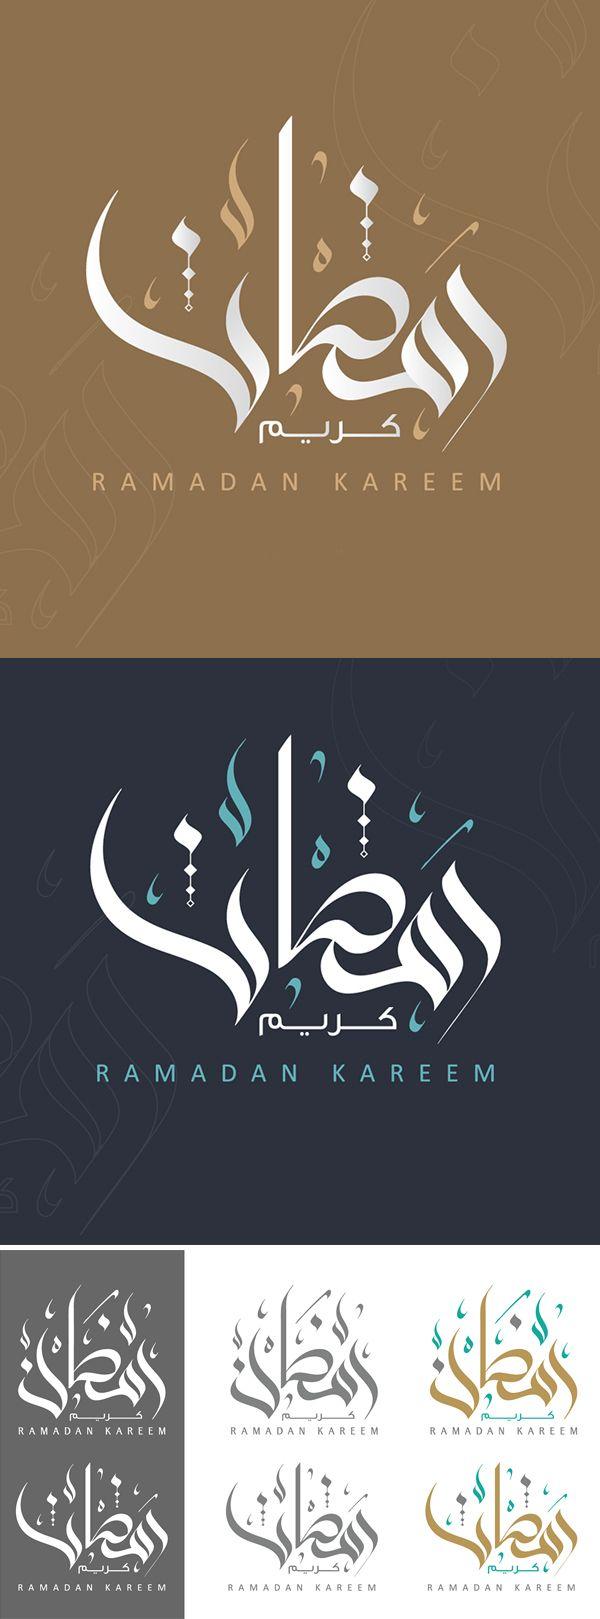 اجمل الصور رمضان كريم 2021 شارك بوستات رمضان كريم Cavaliers Logo Ramadan Kareem Cleveland Cavaliers Logo